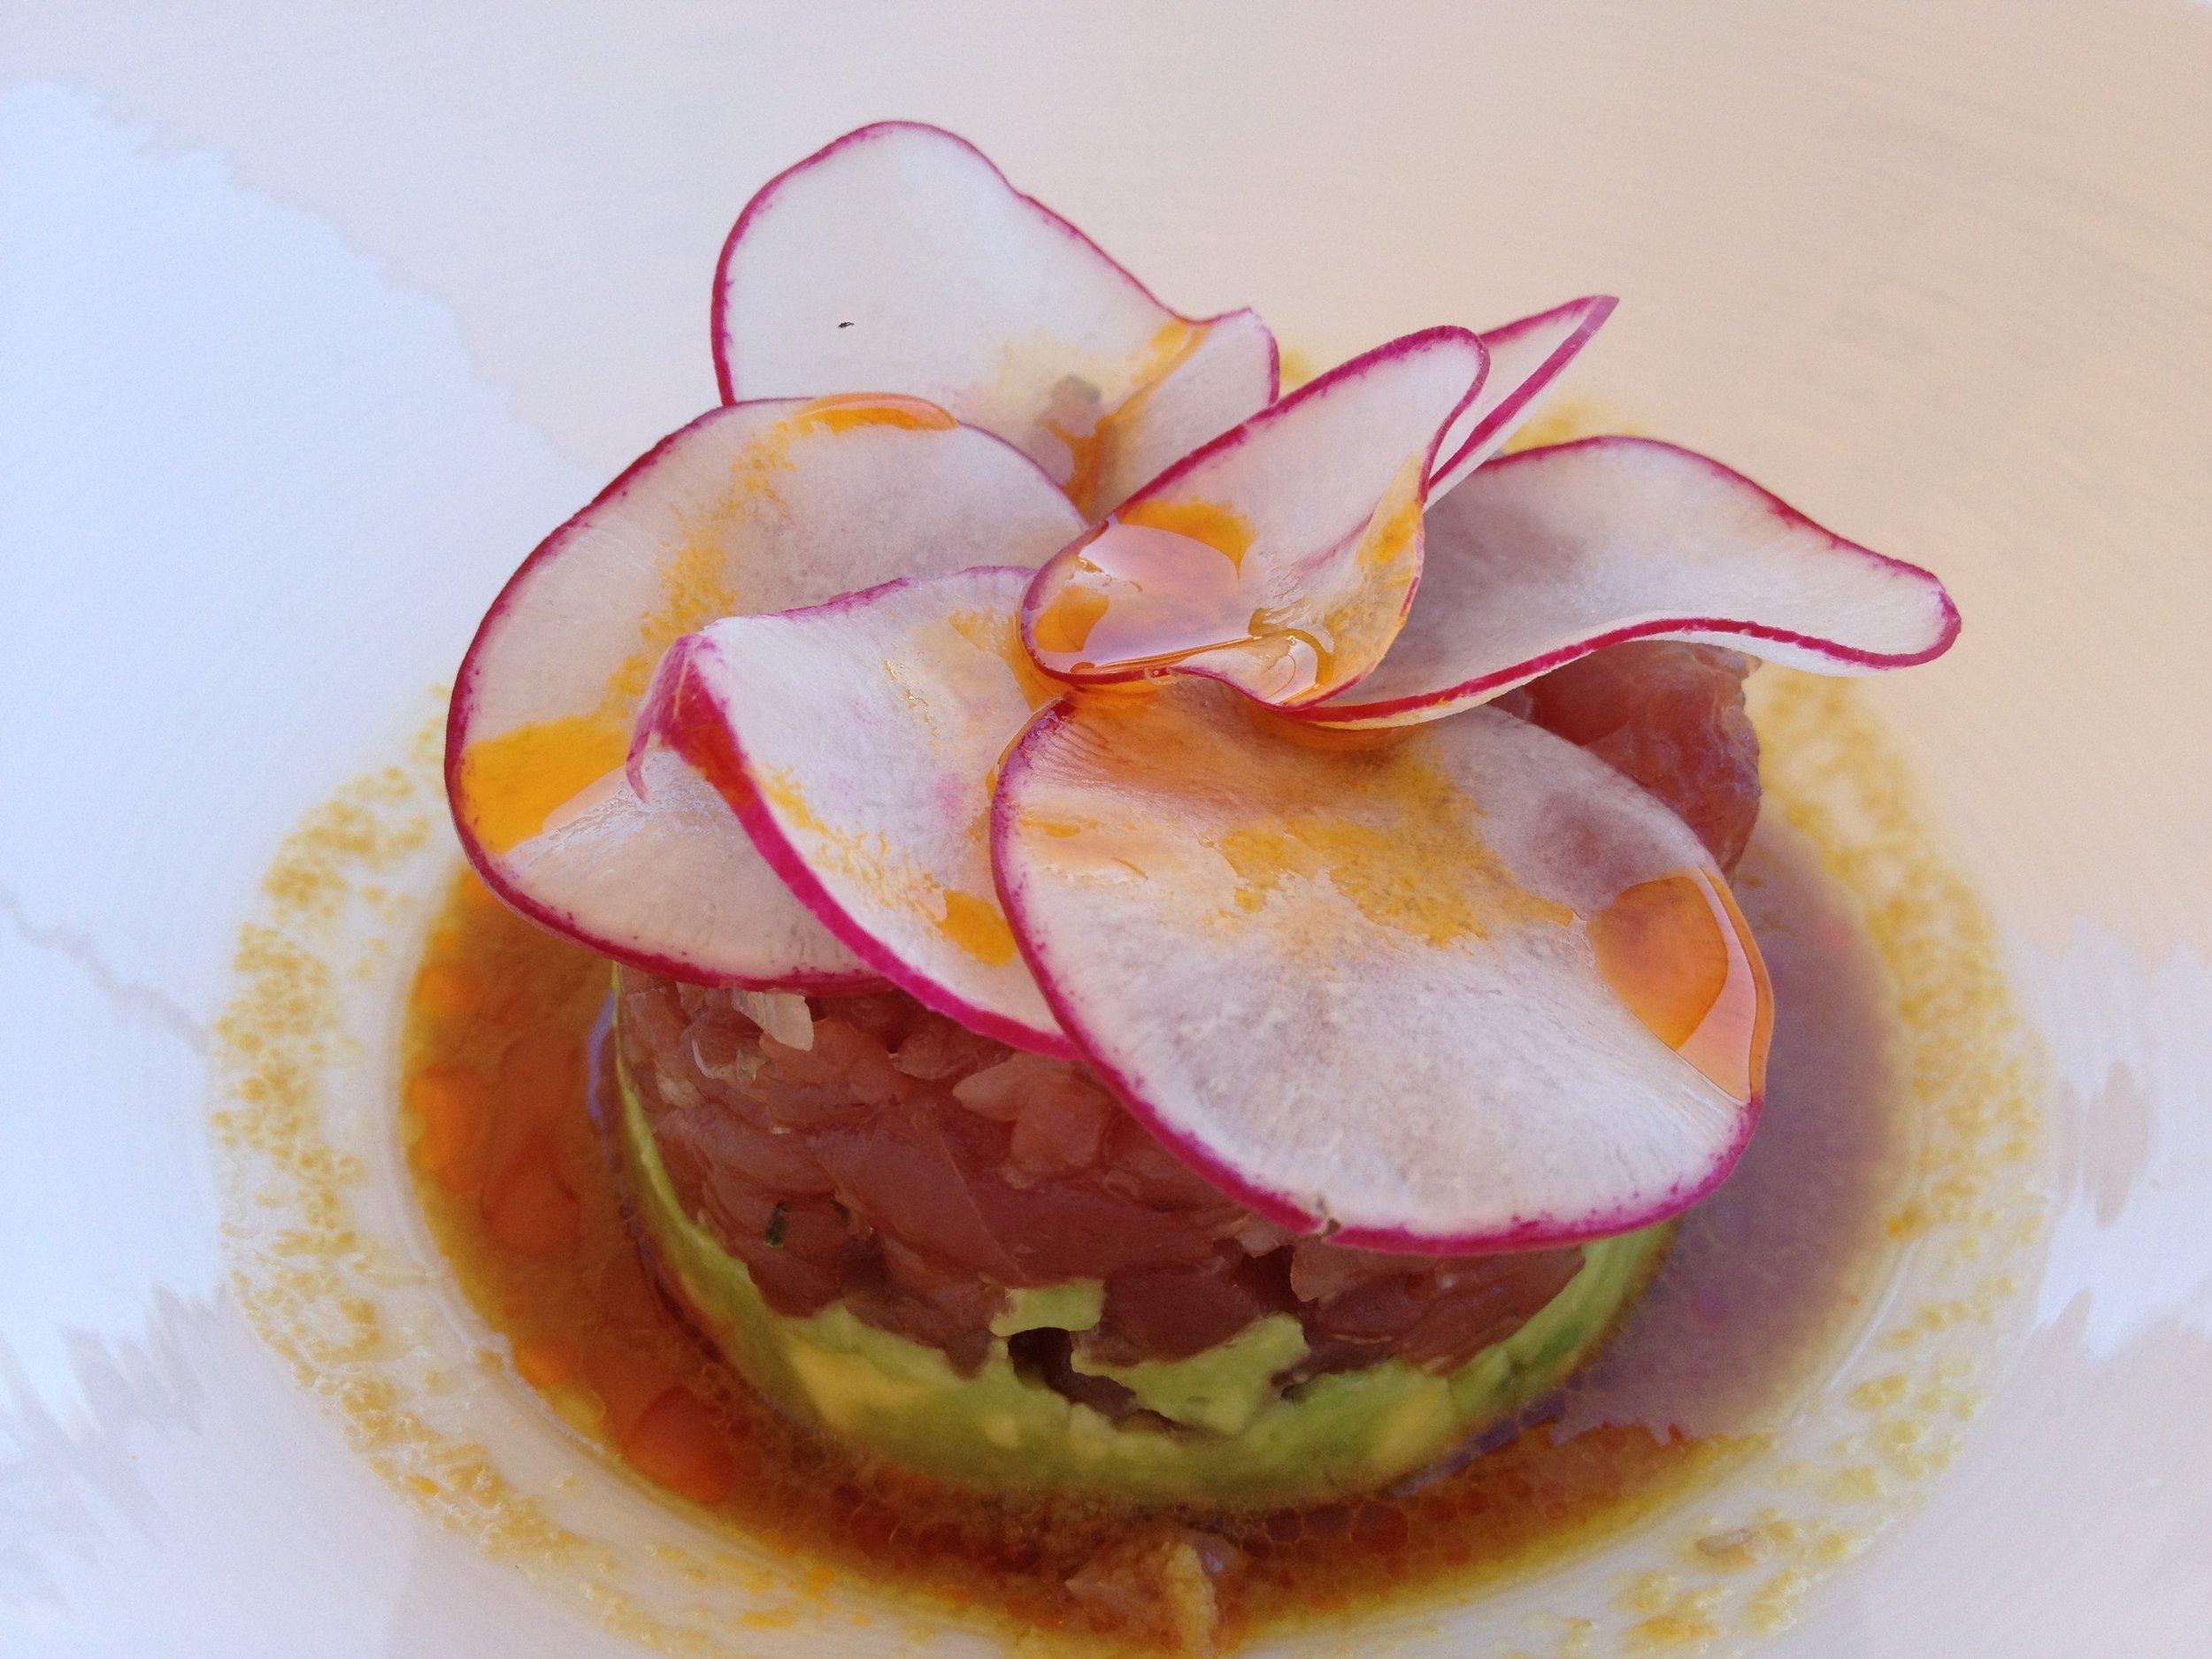 The Tuna tartare appetizer from St. Regis.